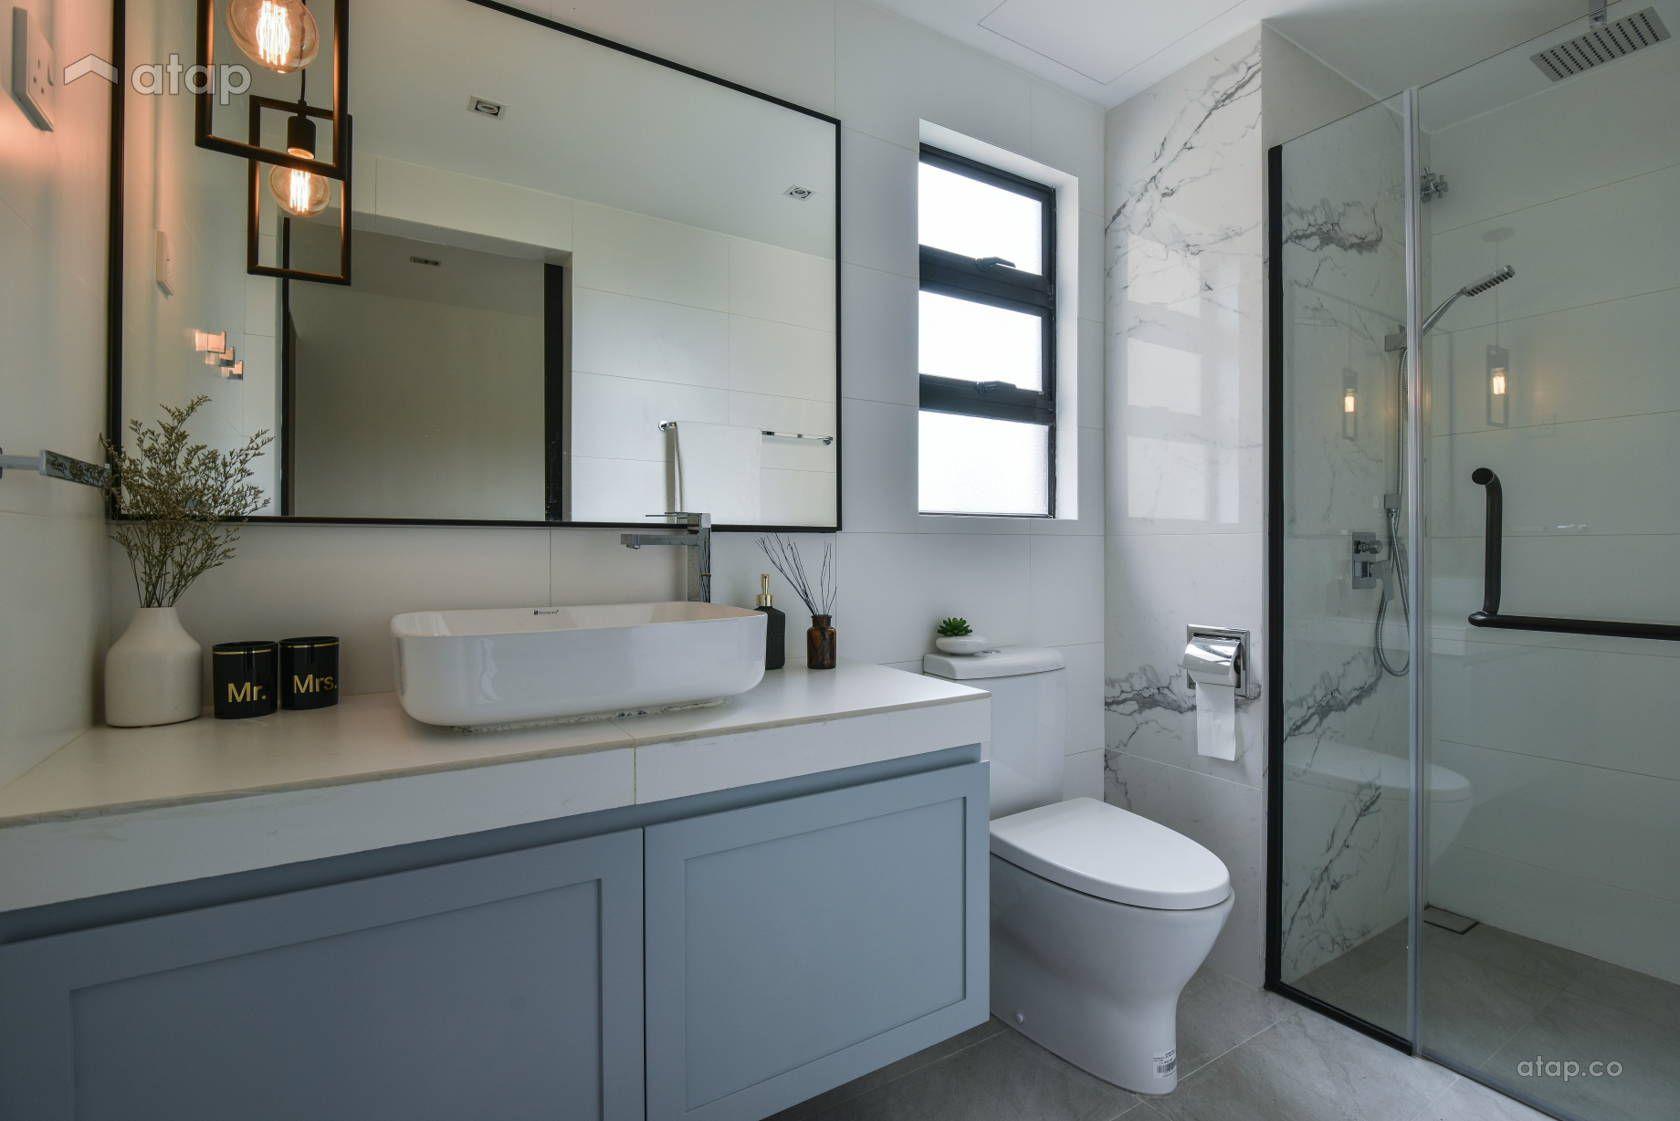 Minimalistic Scandinavian Bathroom Condominium Design Ideas Photos Malaysia Atap Co Bathroom Interior Bathroom Interior Design Condo Bathroom